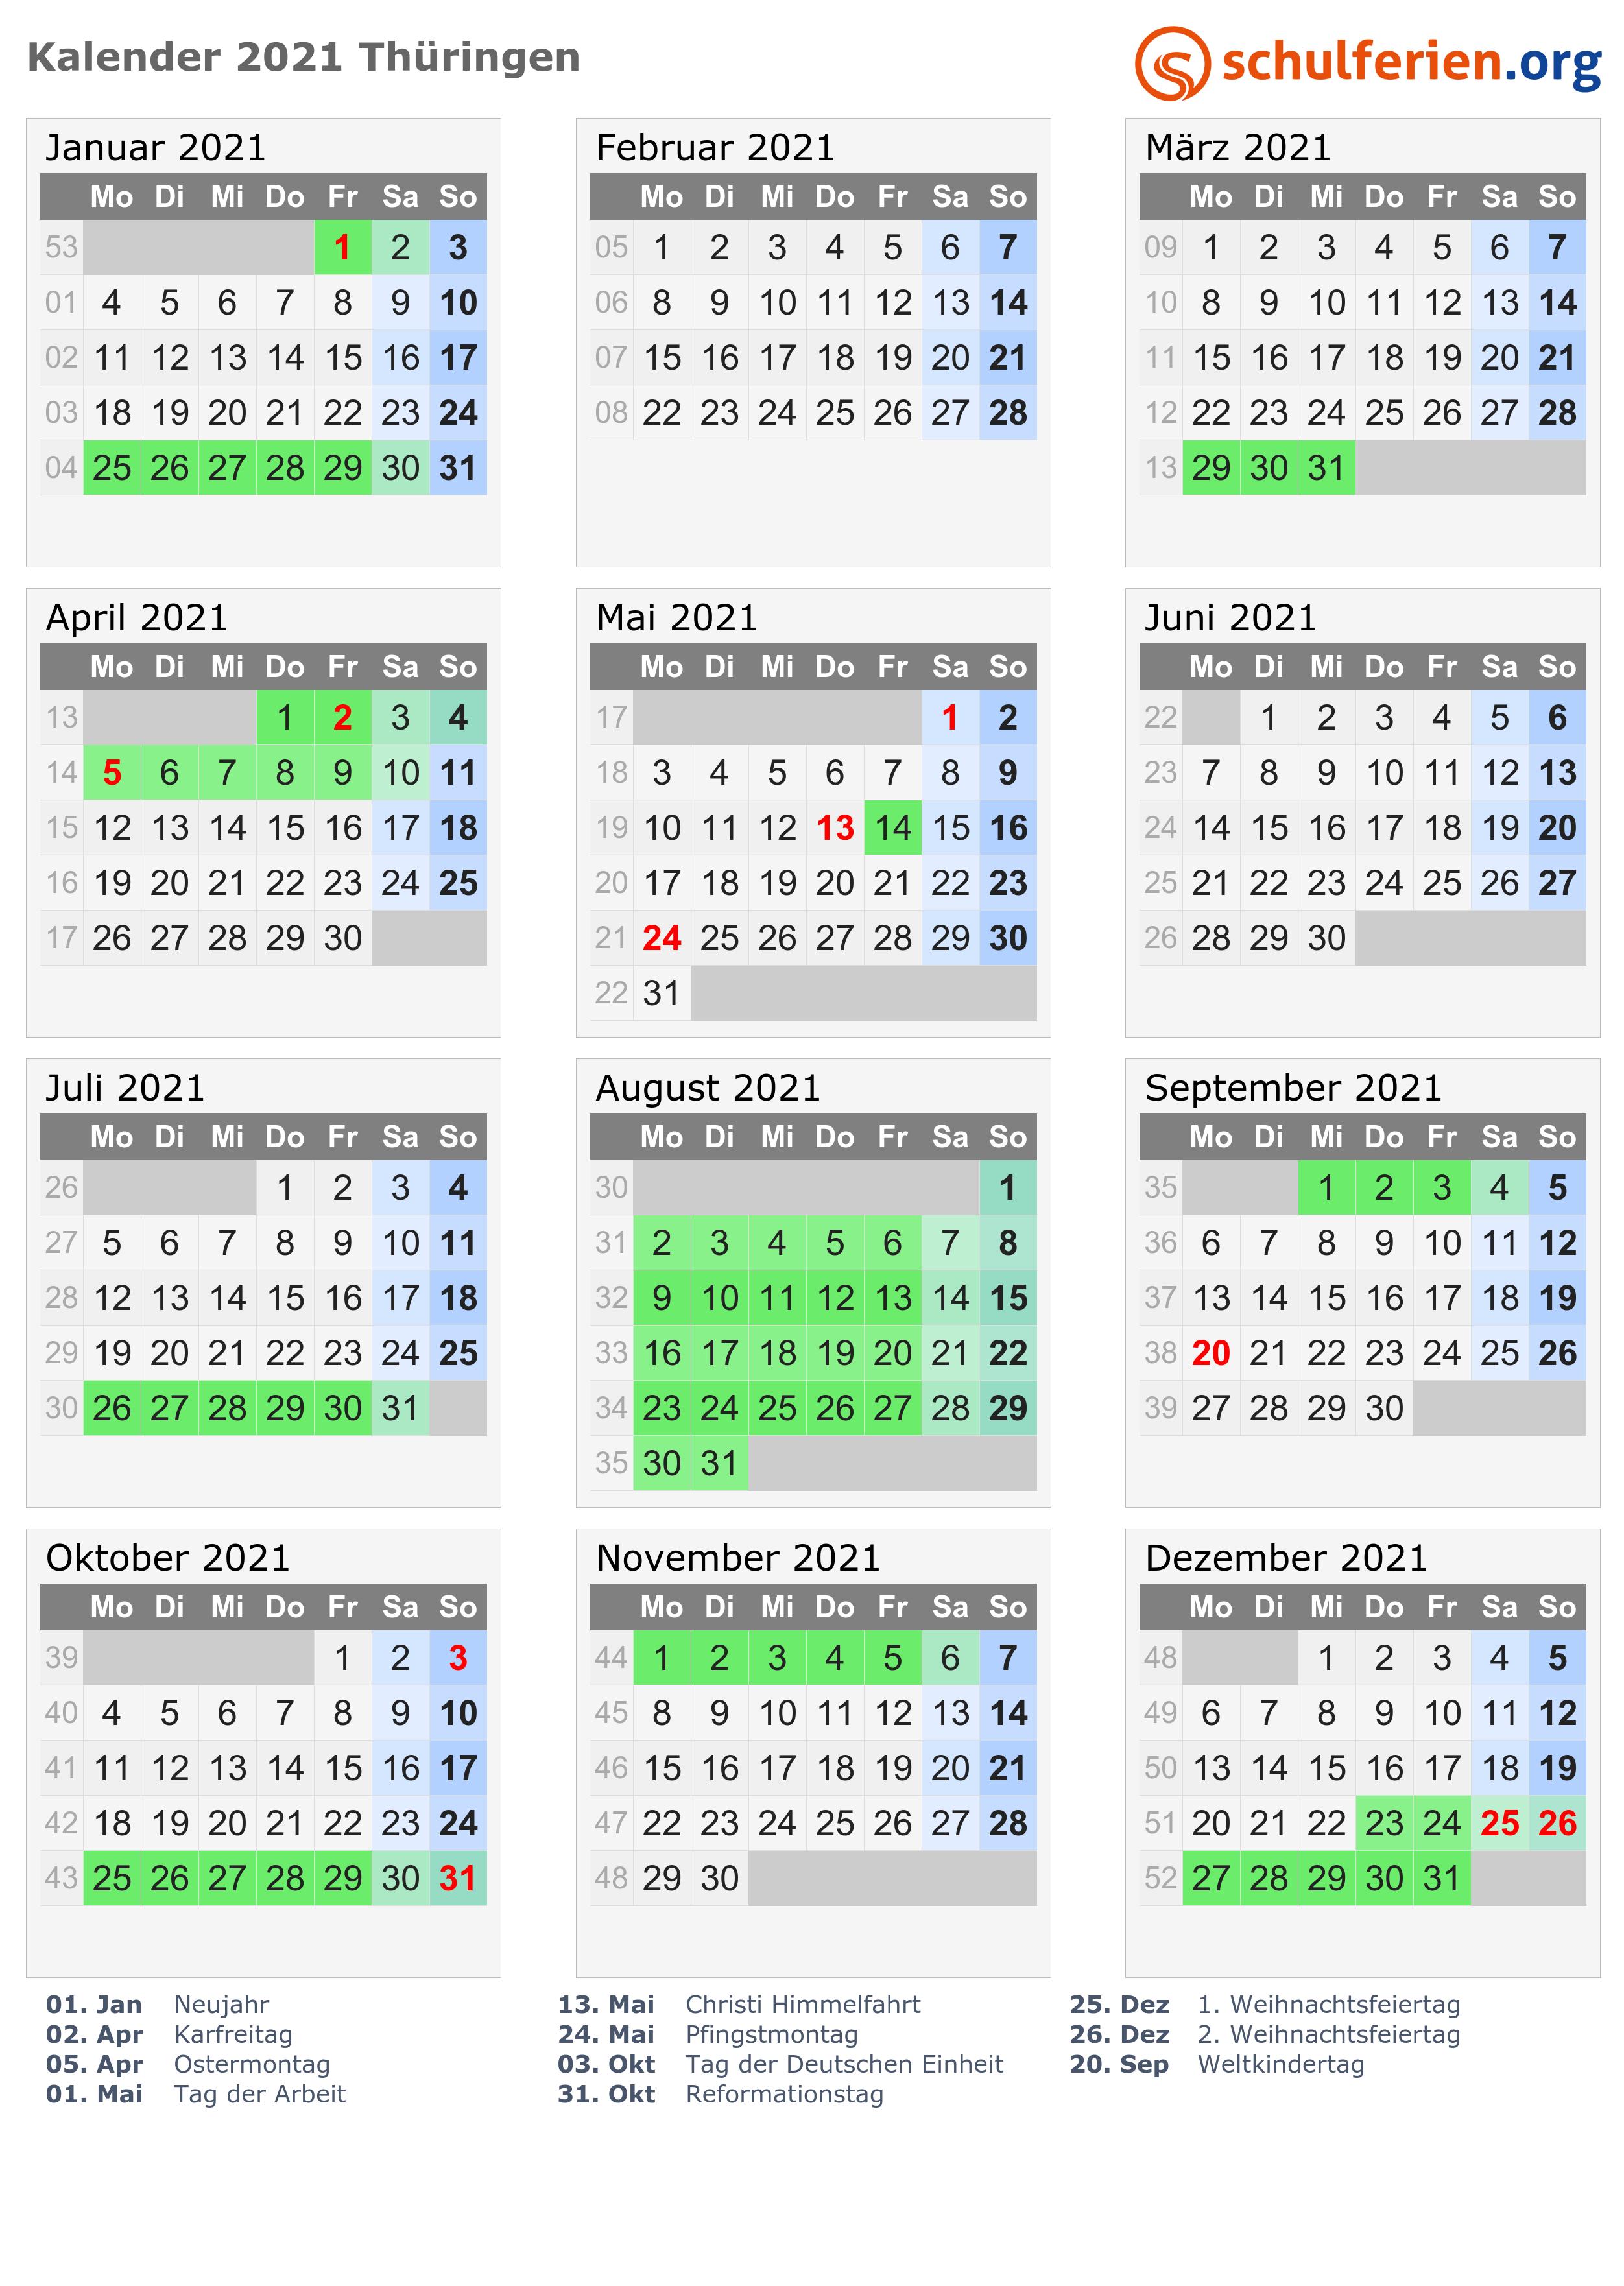 kalender 2021 hessen